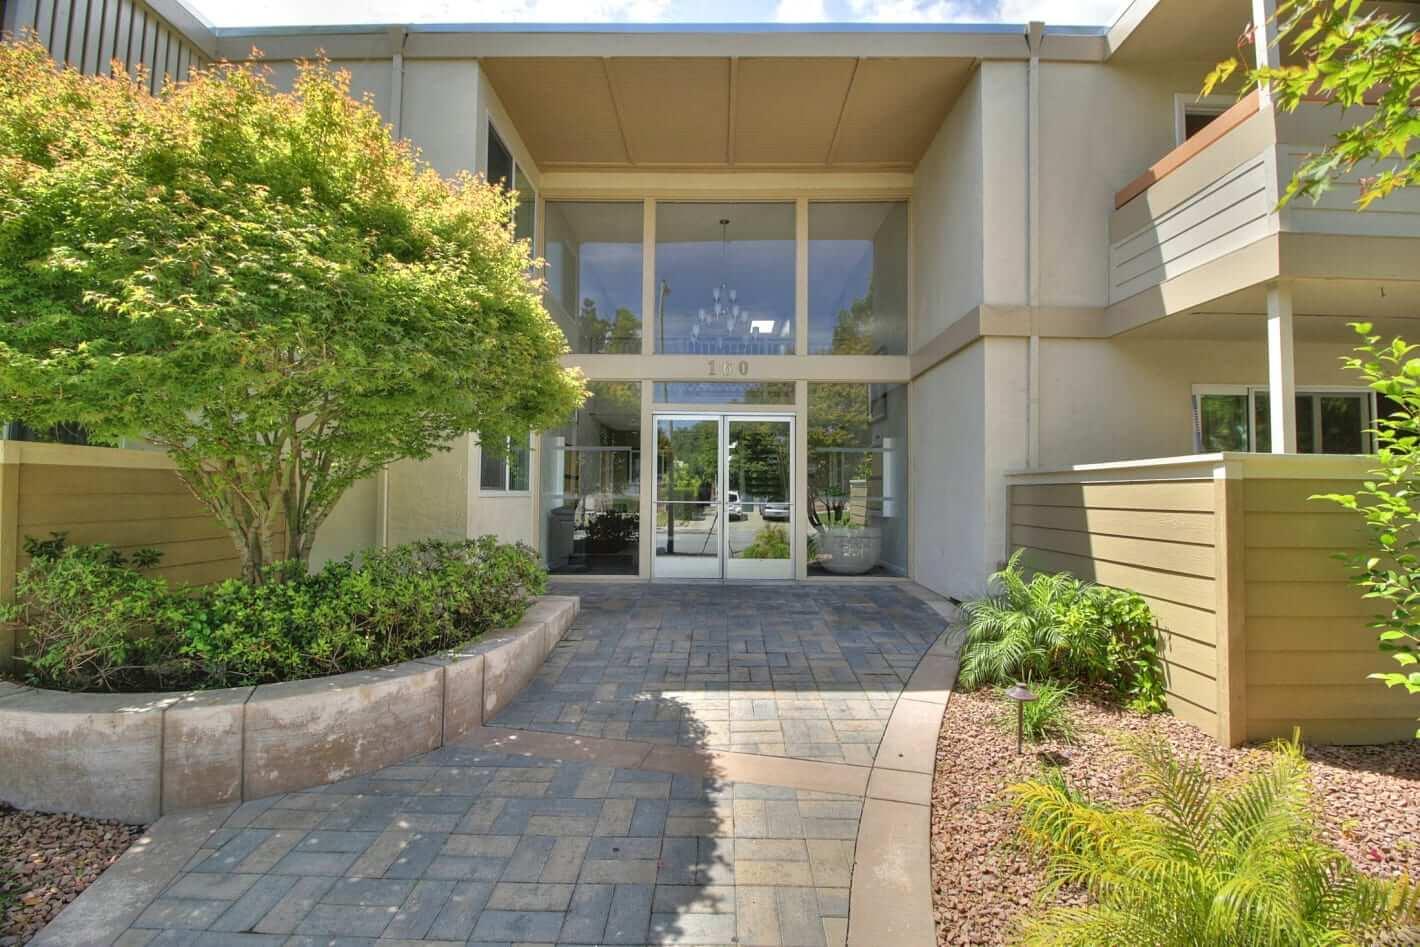 magnolia apartments building exterior